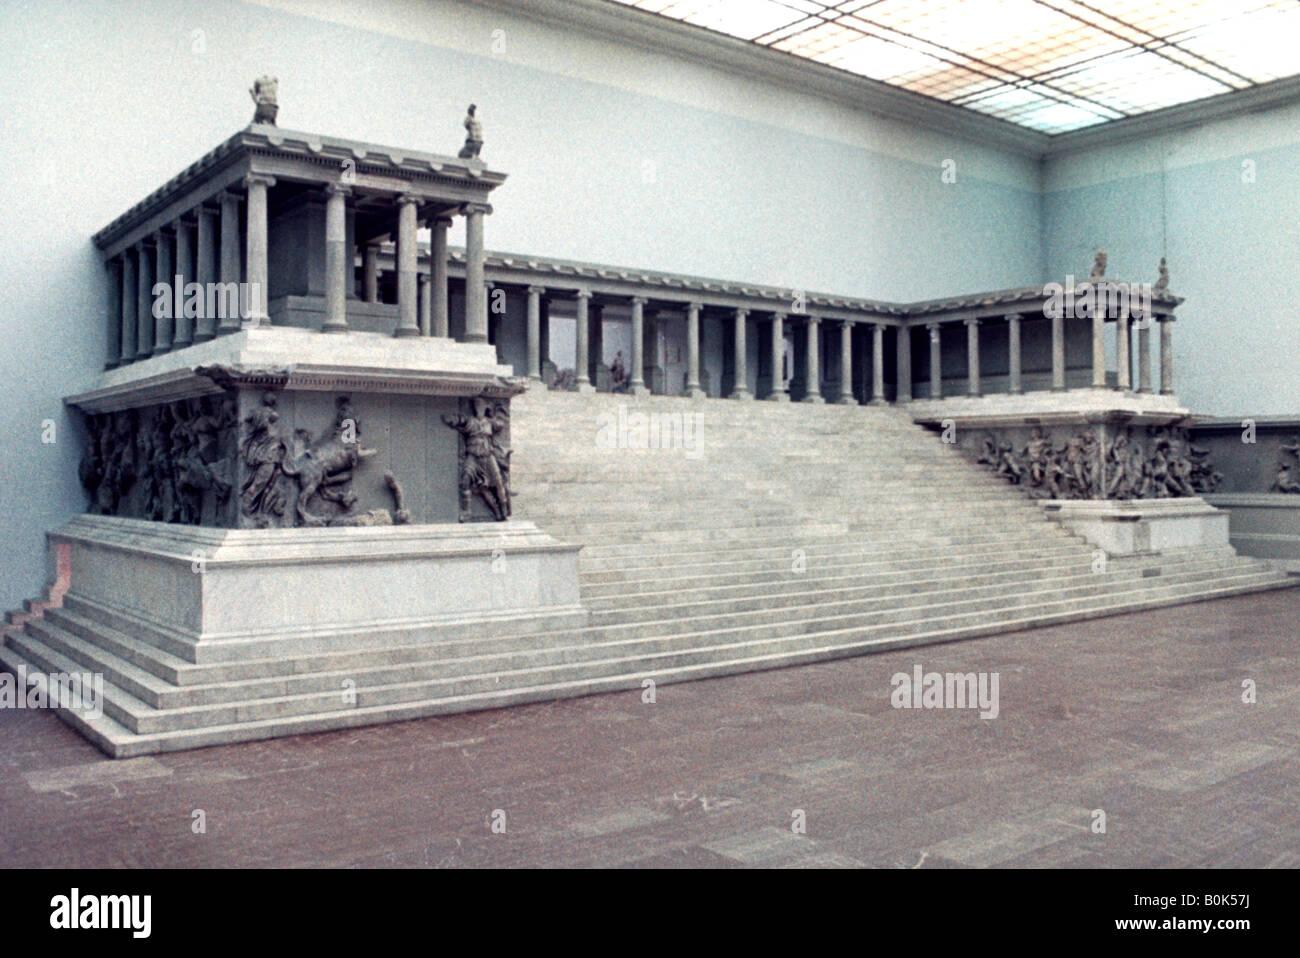 Pergamon Altar, 2nd century BC. Artist: Unknown - Stock Image